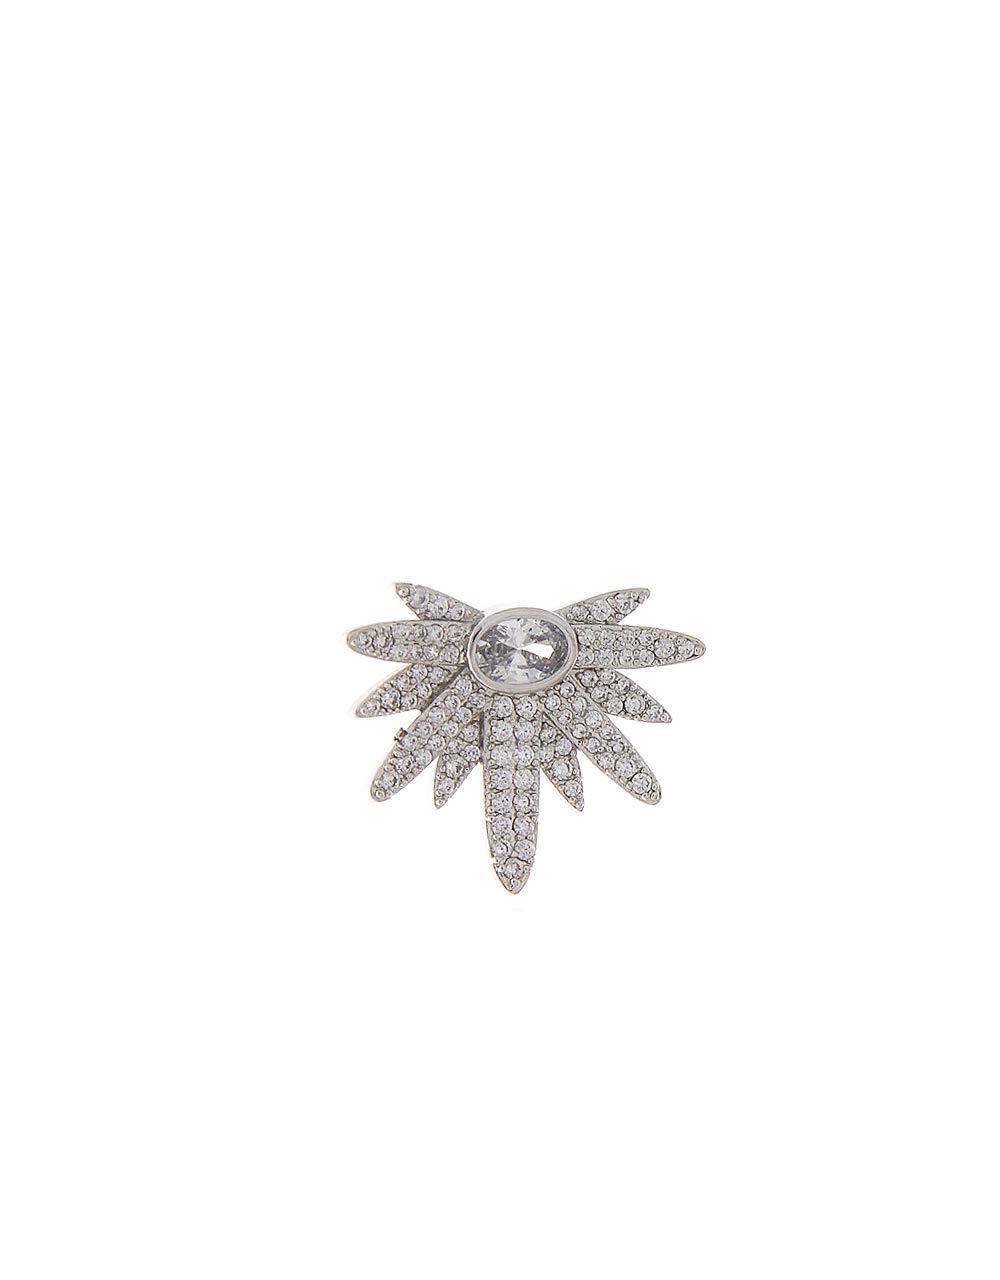 Anuradha Art Silver Finish Classy Designer Studded Stone Adorable Brooch Lapel Pin for Women/Men